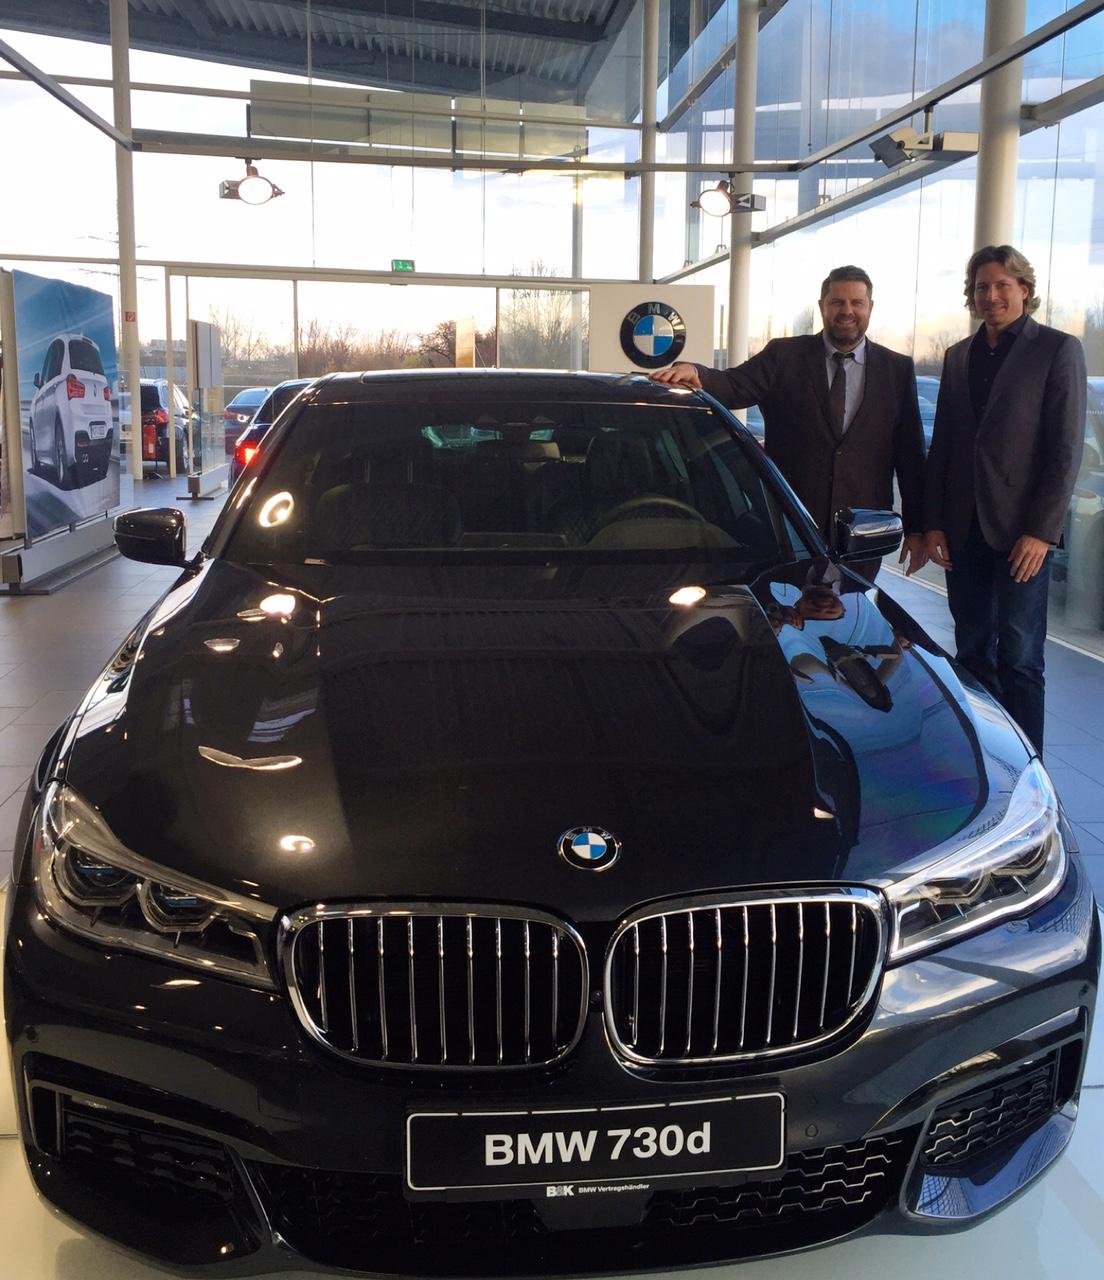 images/BK BMW 12.02.2016.jpg